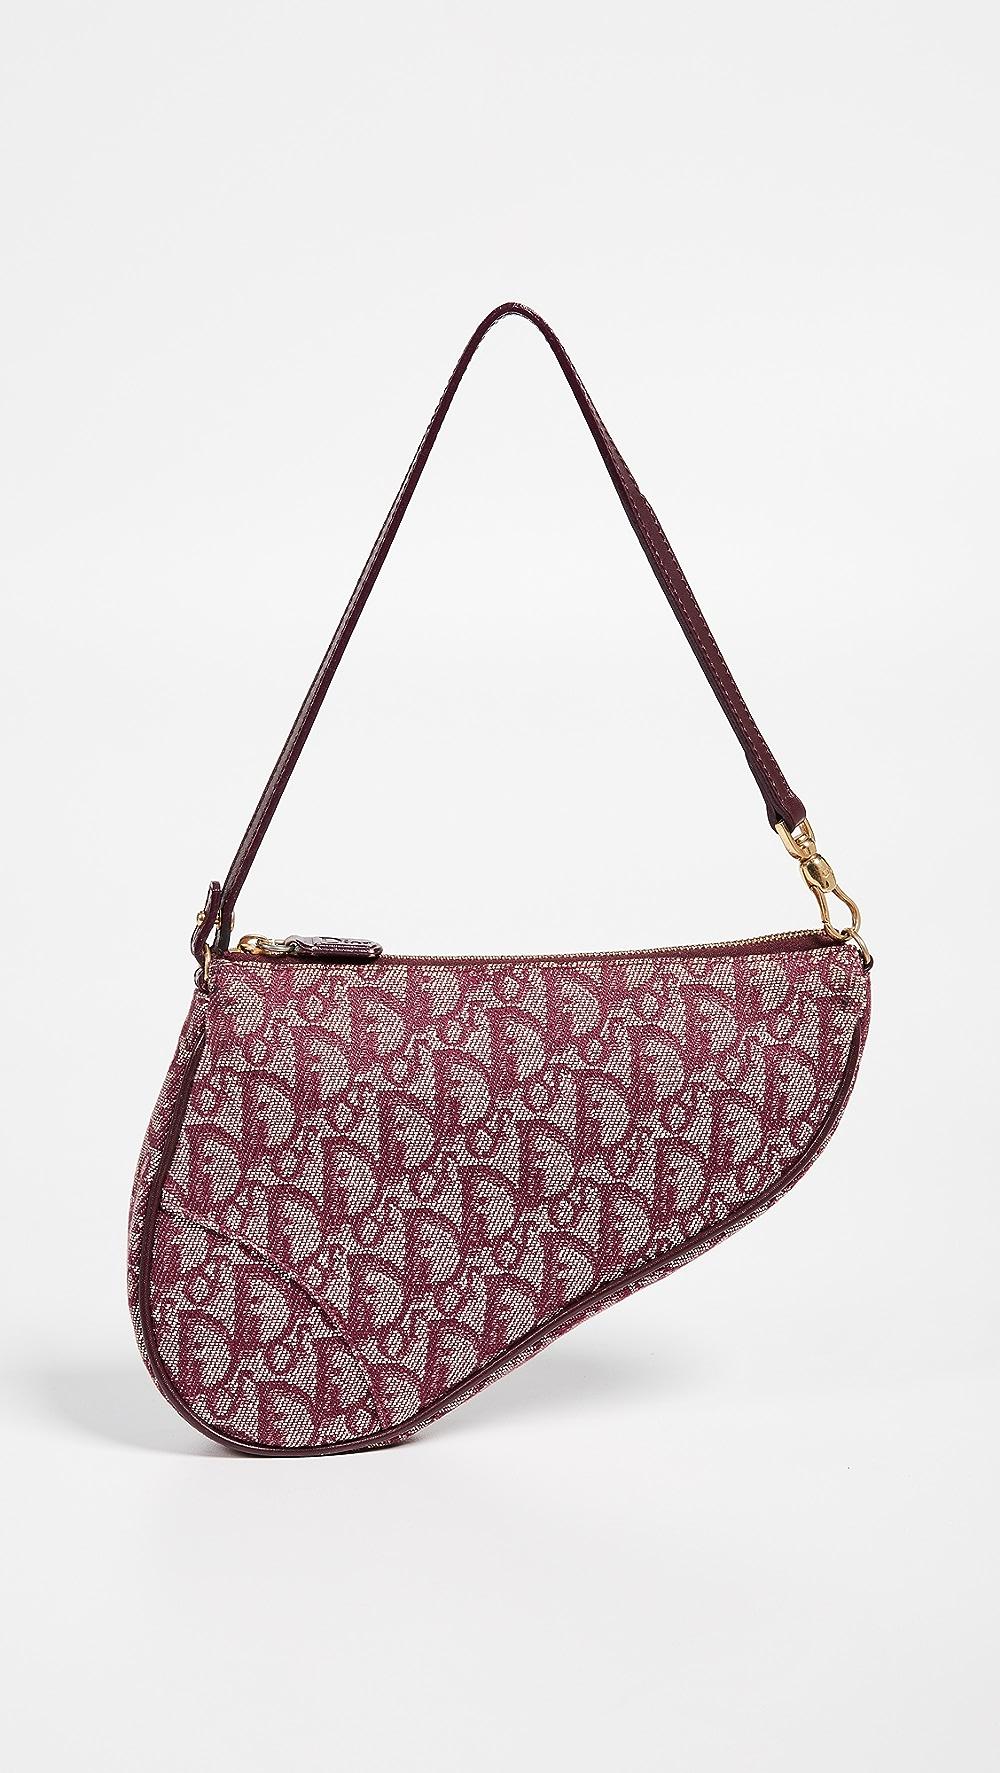 Rapture What Goes Around Comes Around - Dior Burgundy Canvas Saddle Mini Bag High Quality Goods